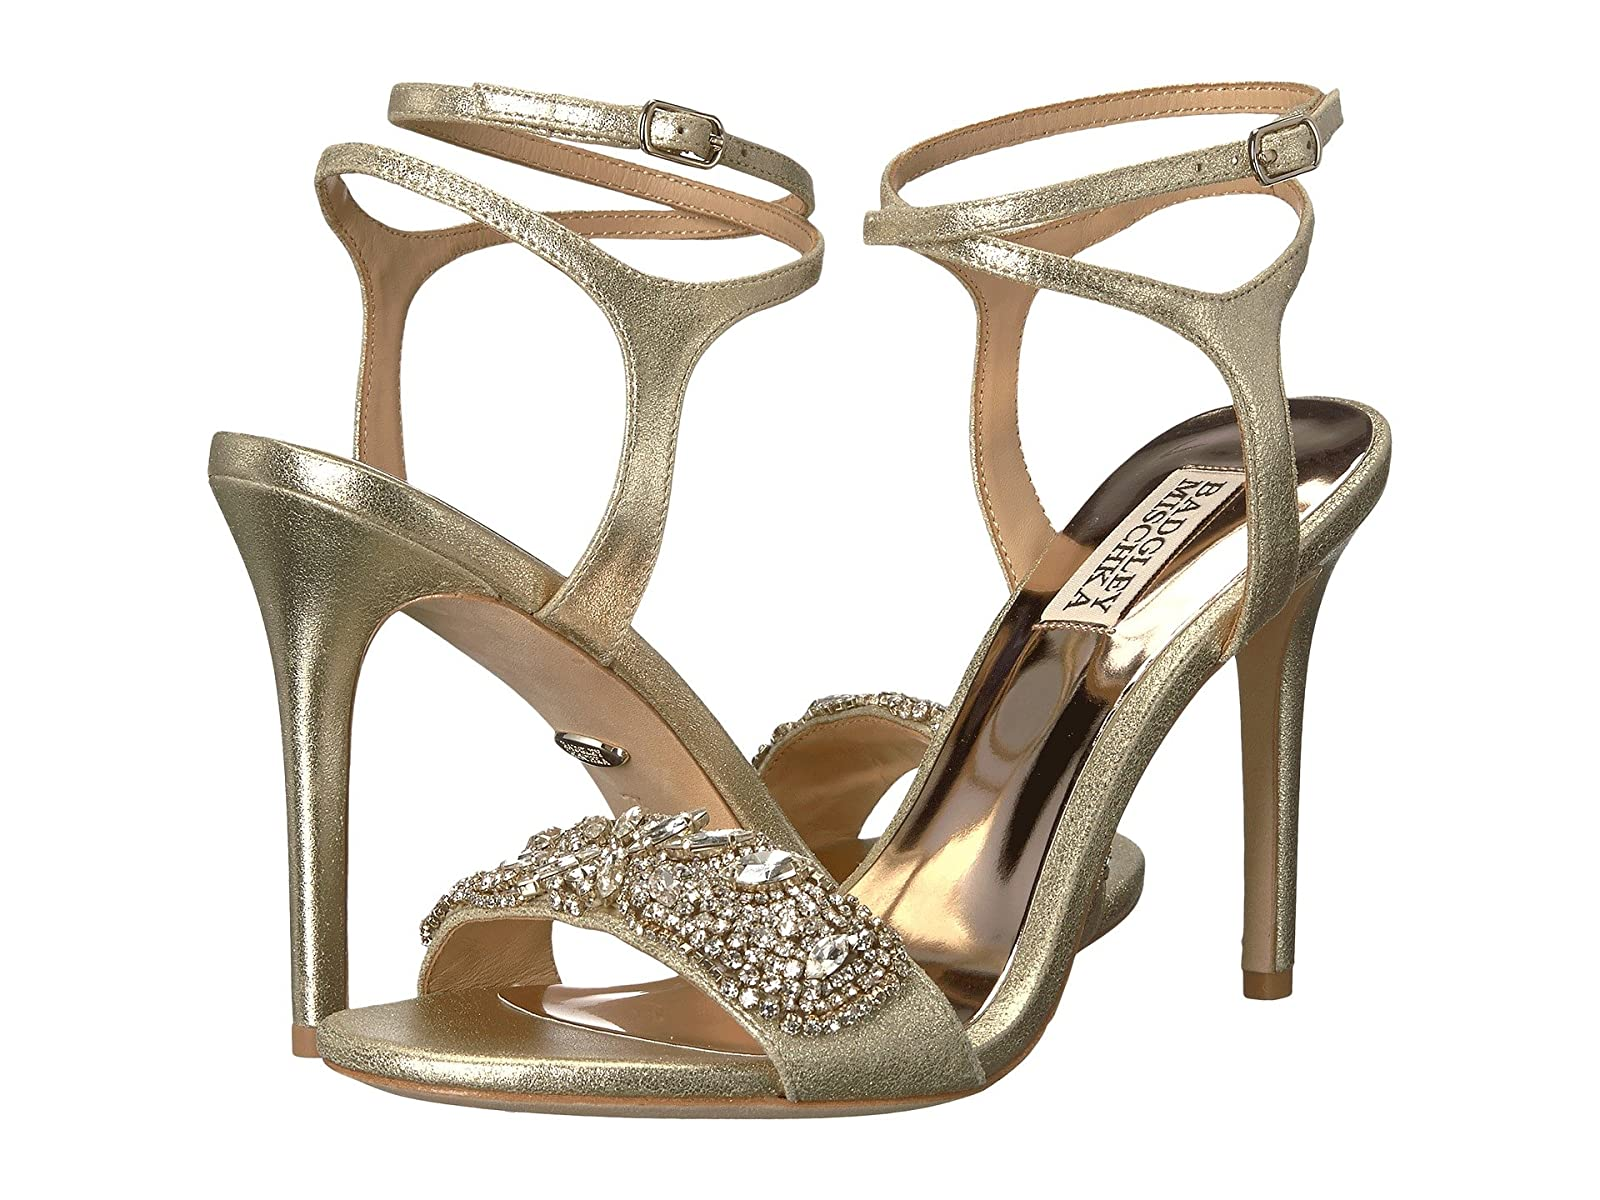 Badgley Mischka HaileyCheap and distinctive eye-catching shoes